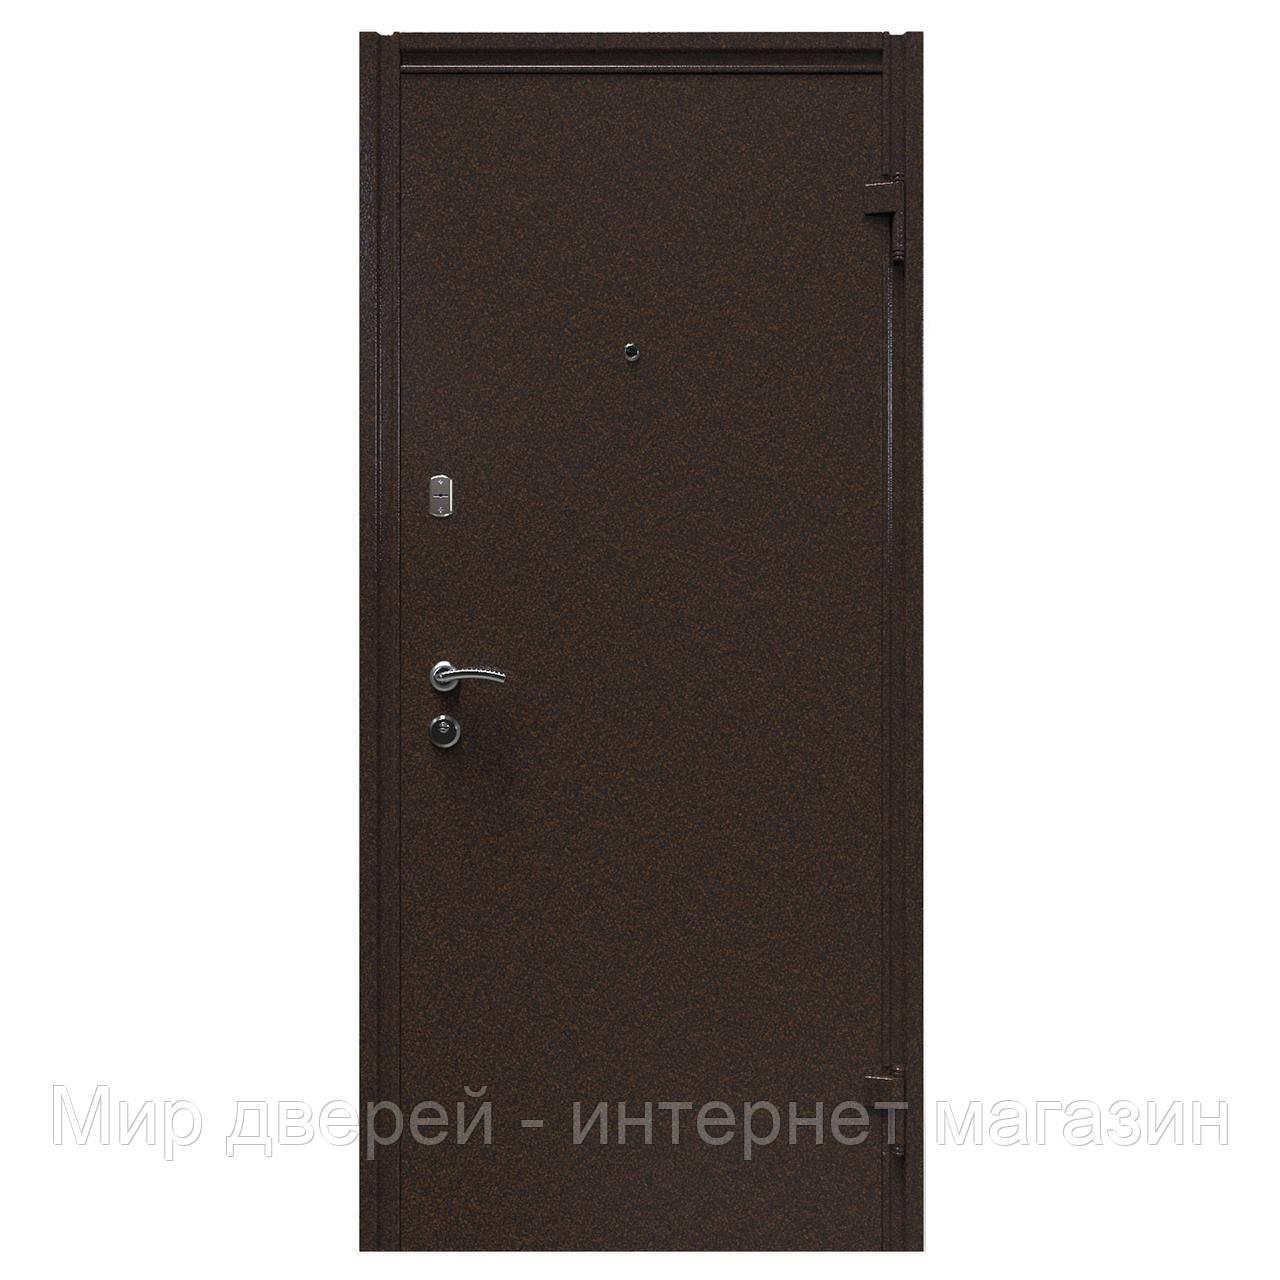 Двери входные KASKAD Молоток / МДФ Глухая